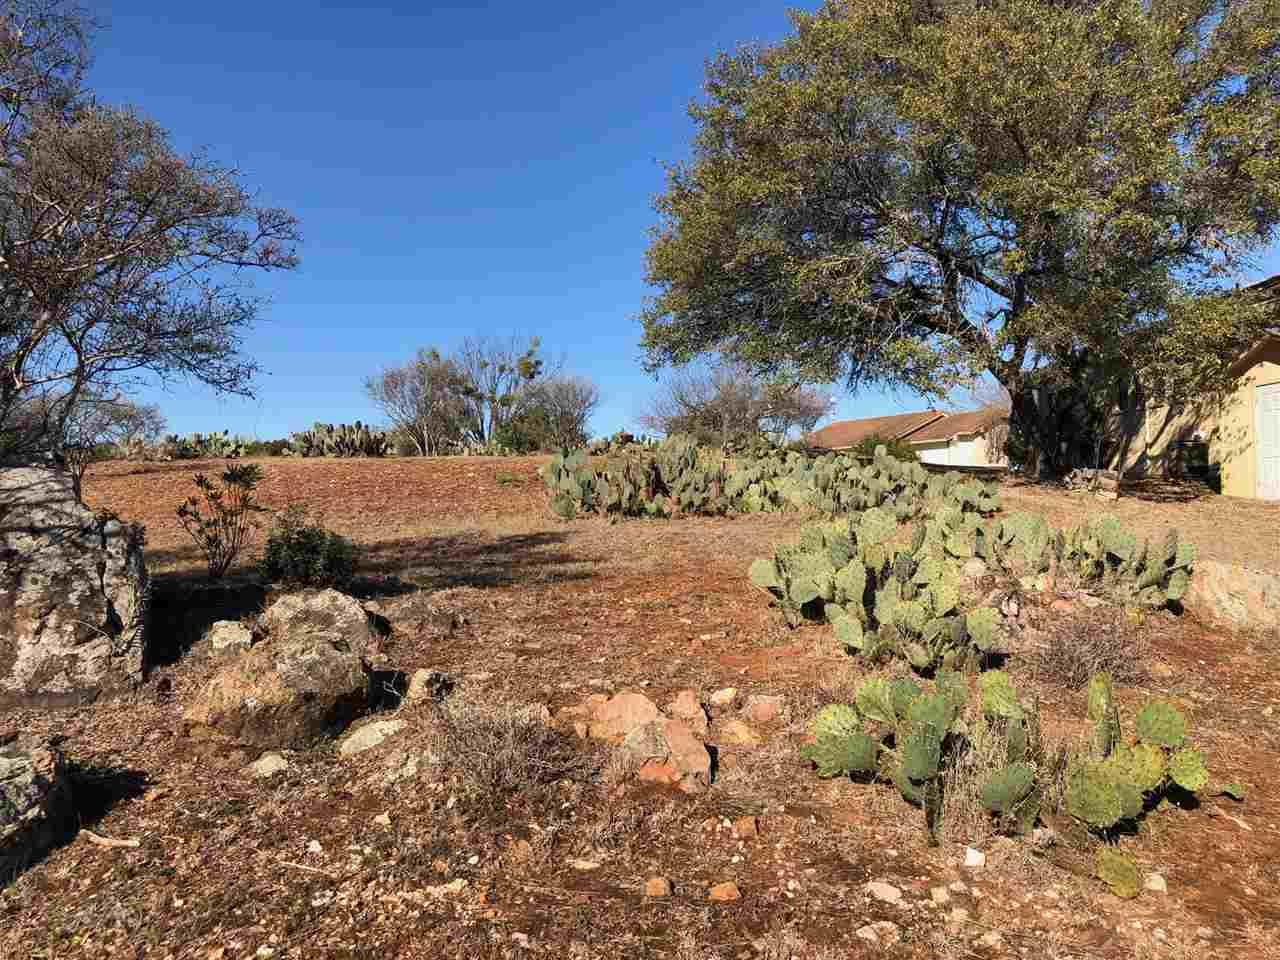 Lot W11058 Broken Hills Dr